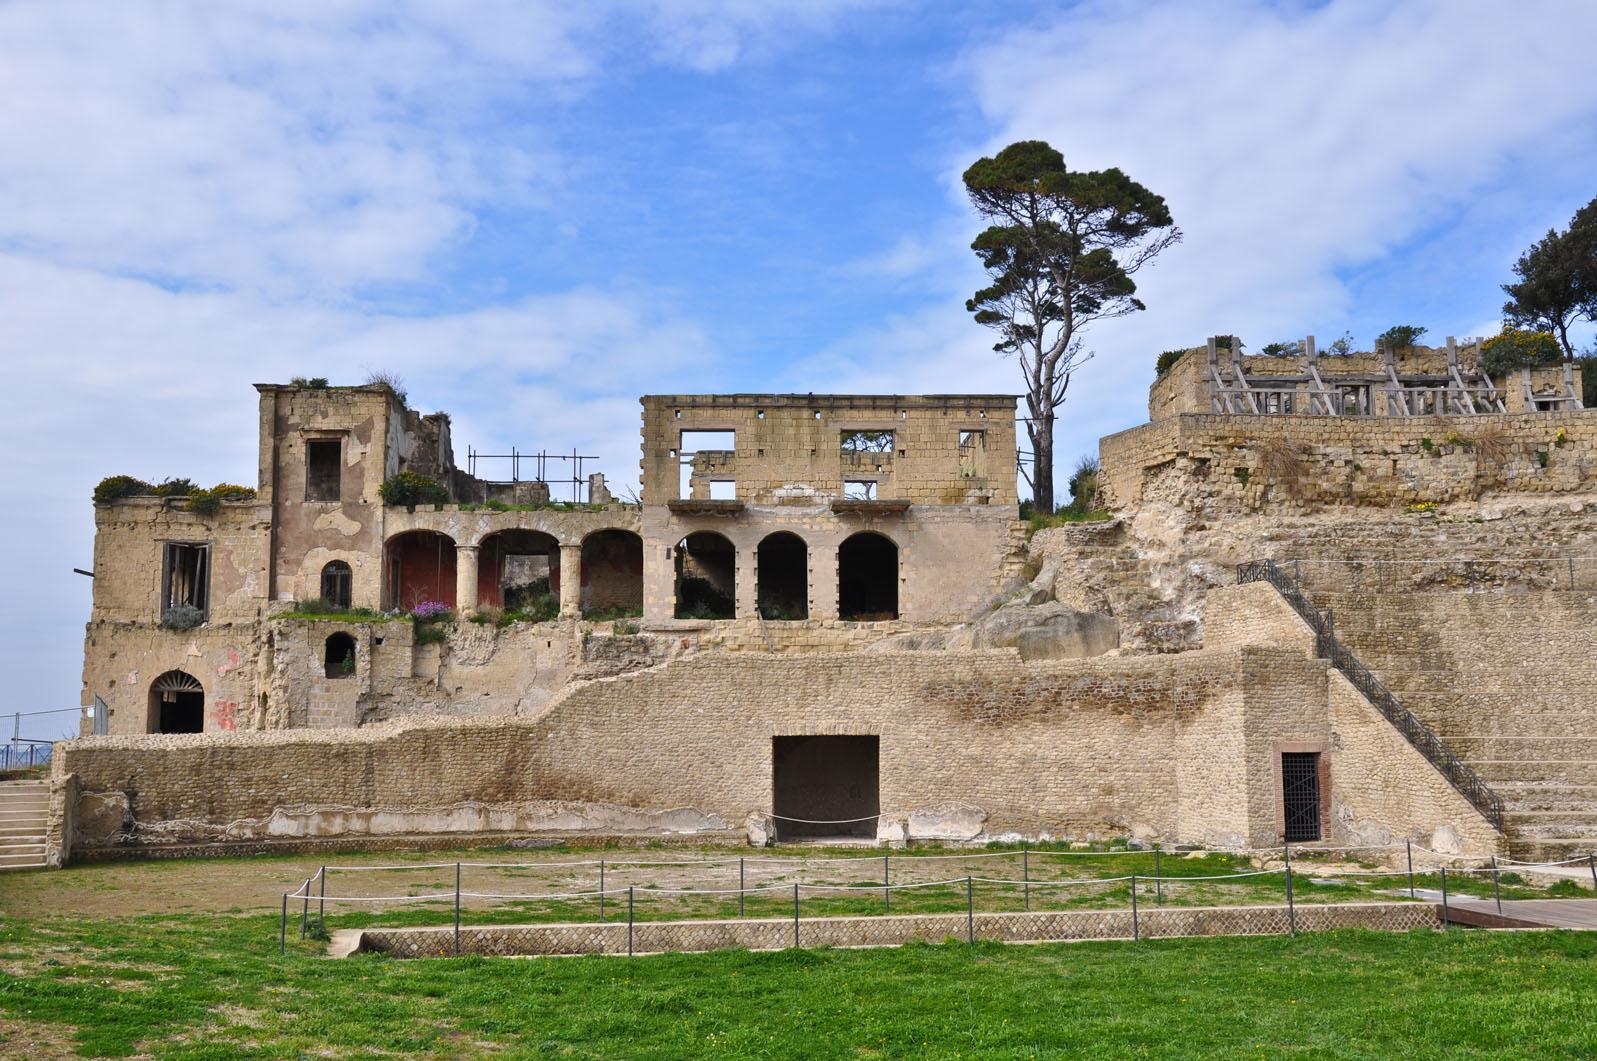 Parco_archeologico_del_Pausilypon_low